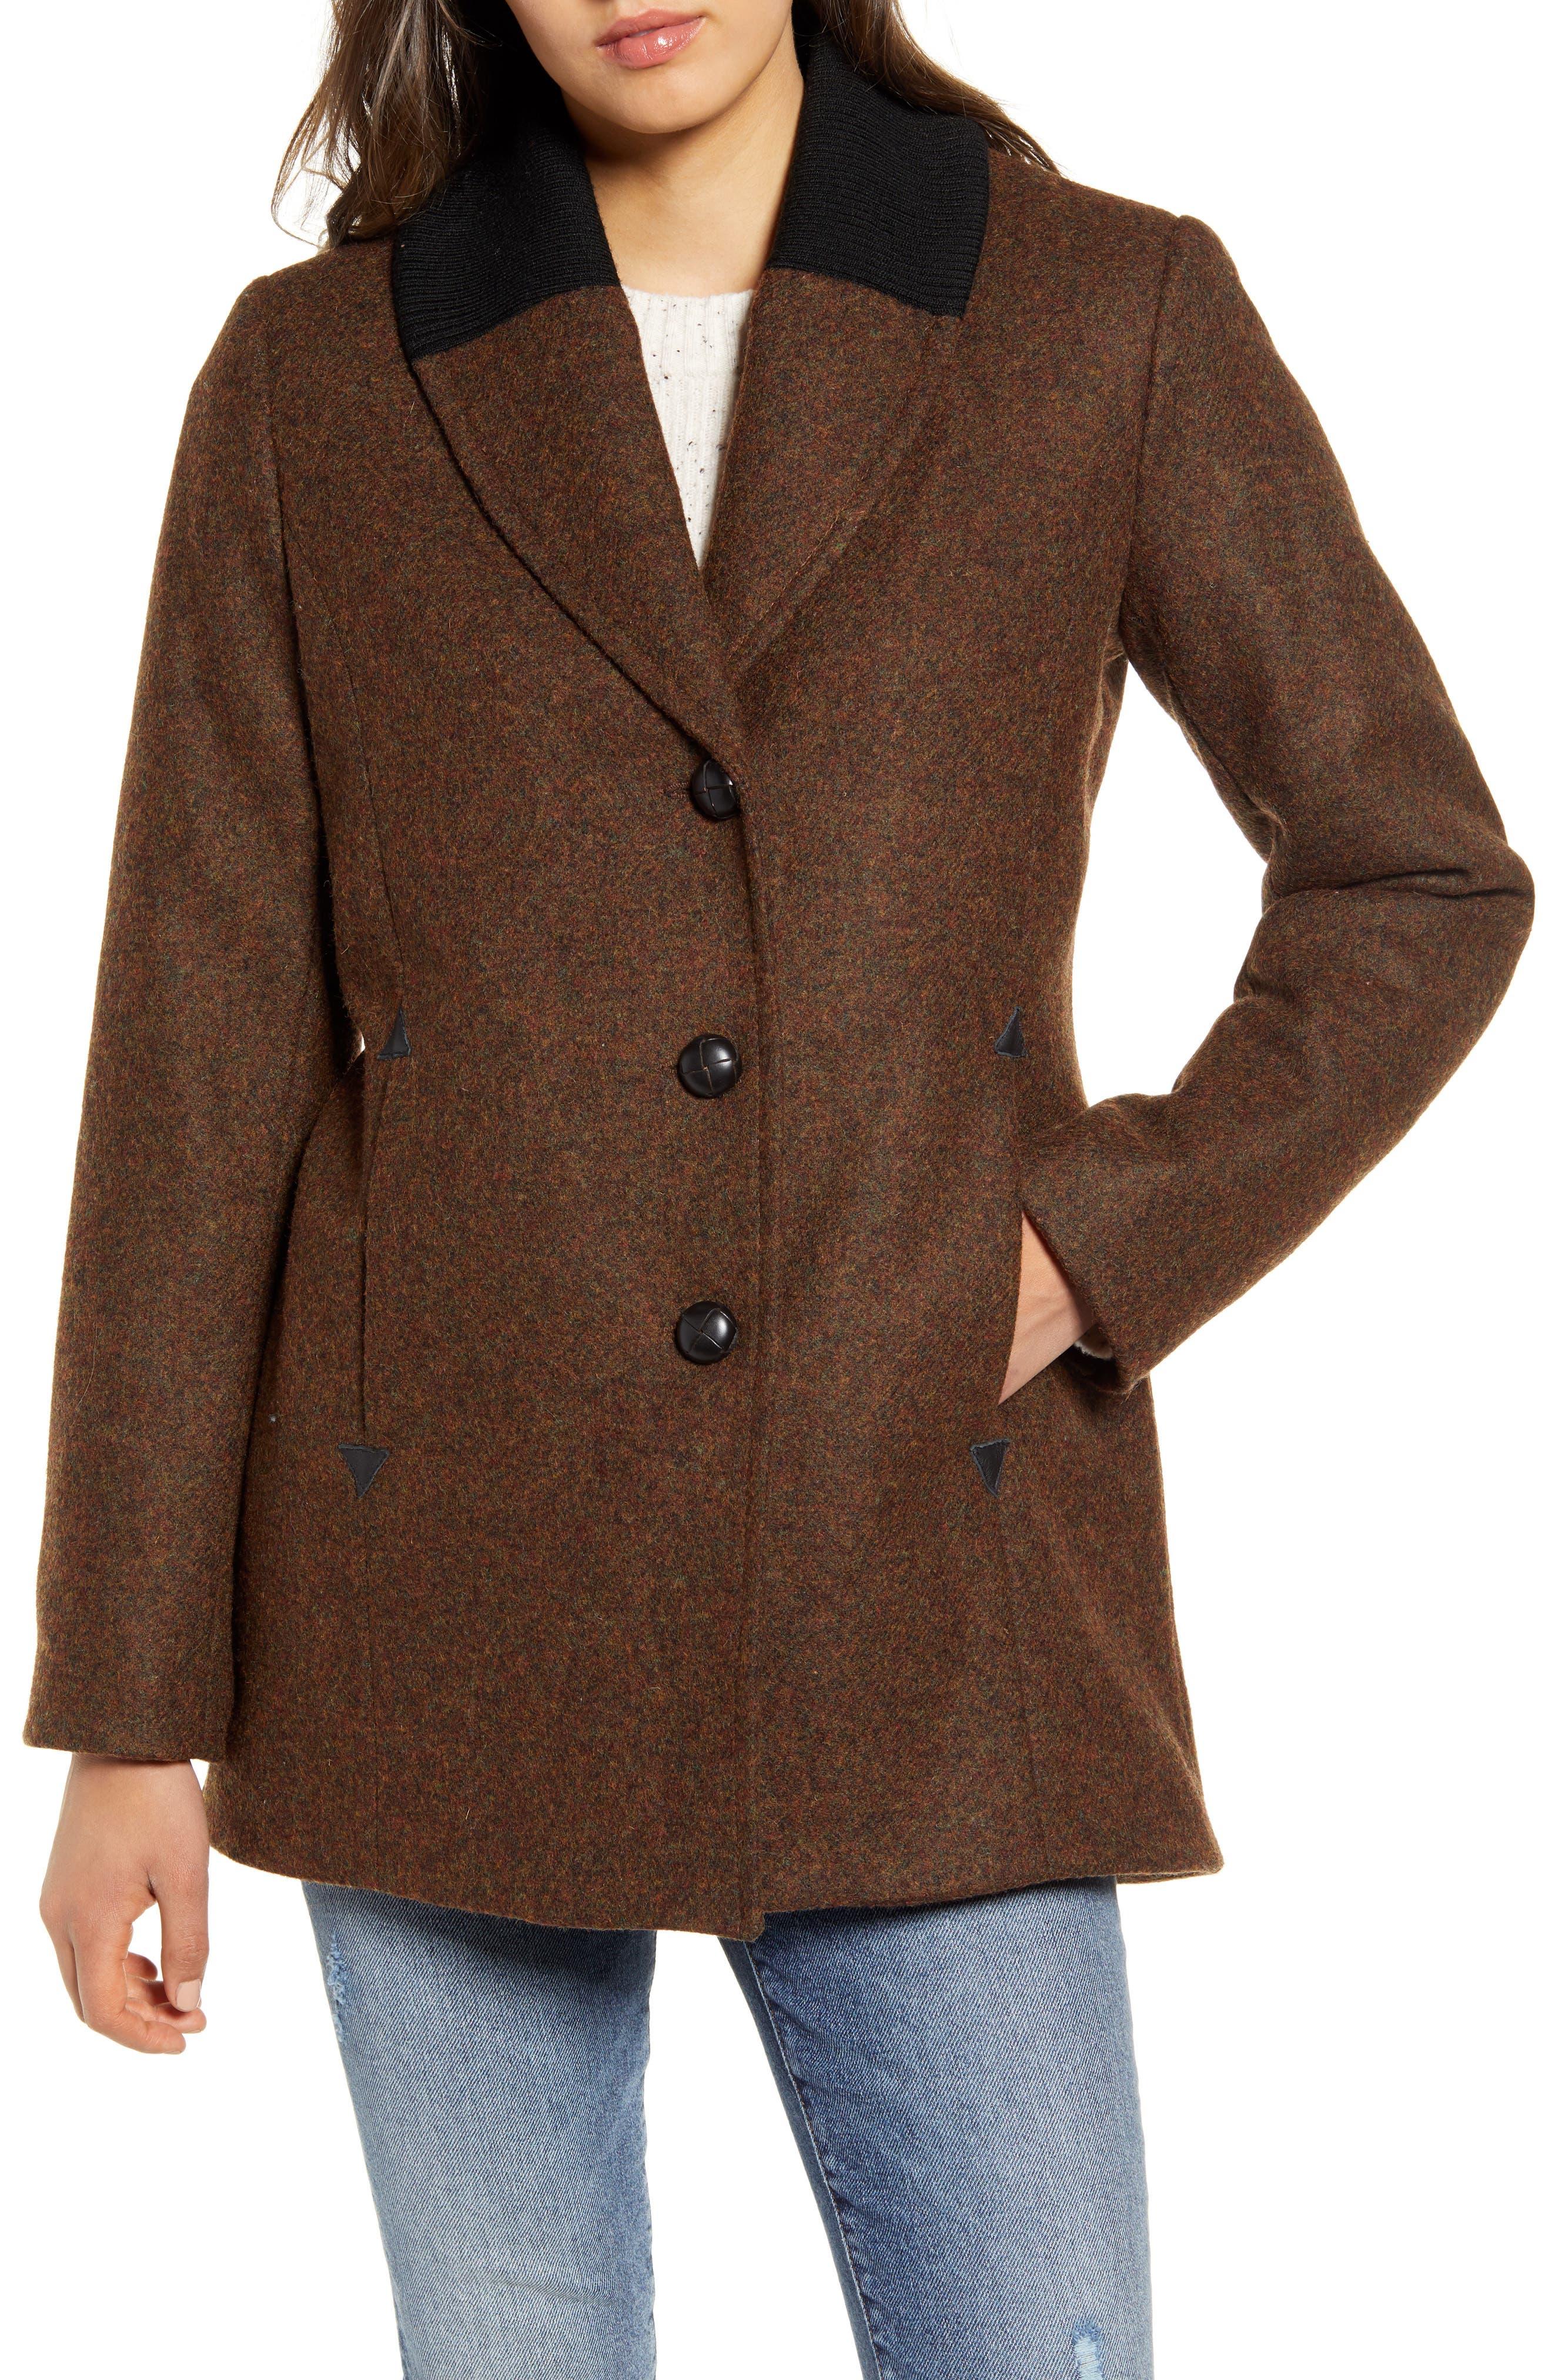 c01d19659 Women's Pendleton Coats & Jackets | Nordstrom